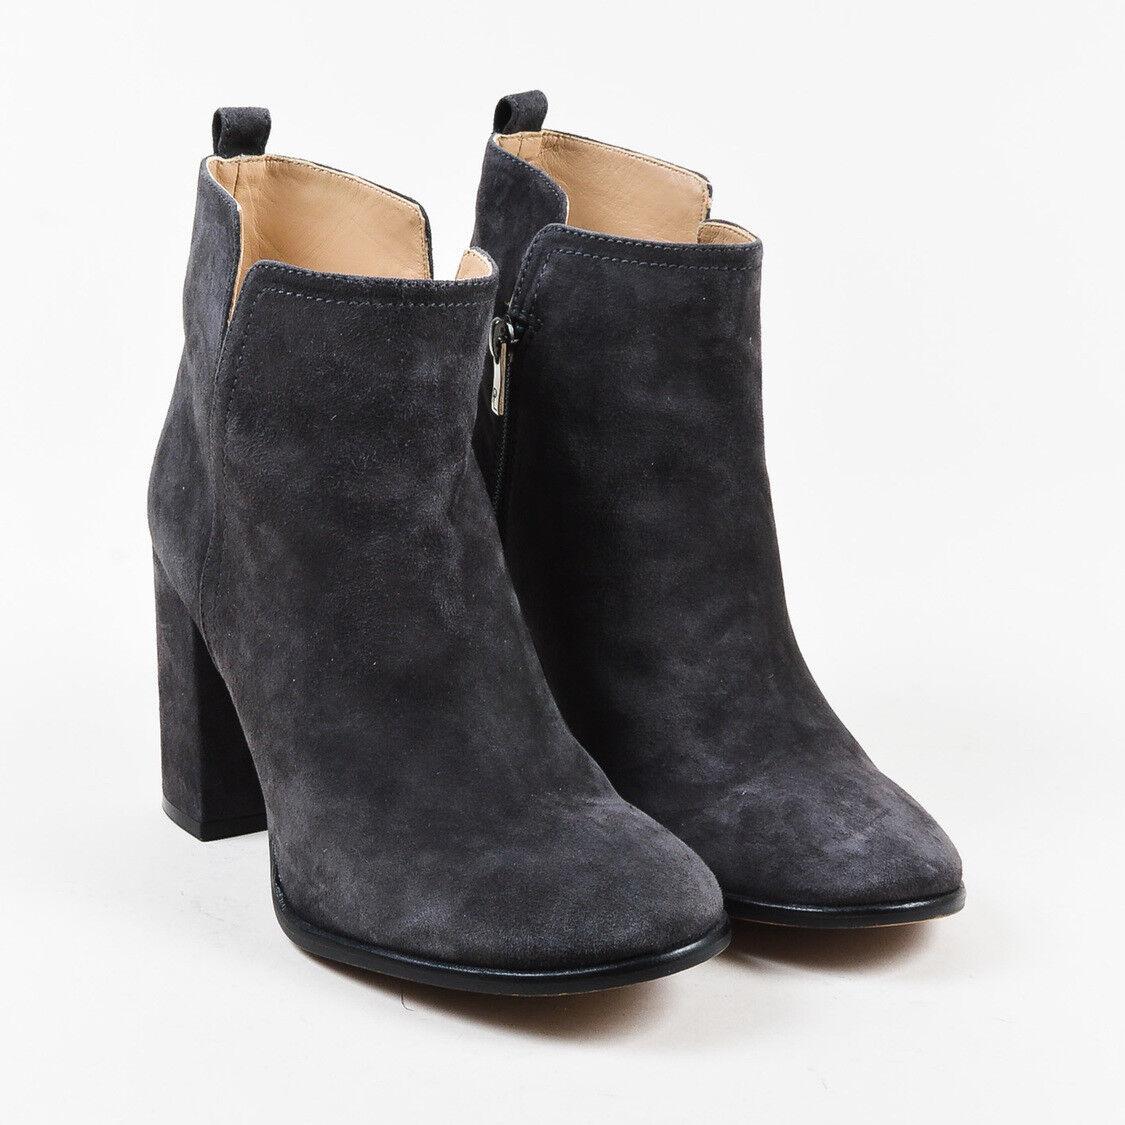 Pura Lopez  Gray Suede Round Toe High Heel Ankle Stiefel SZ 39